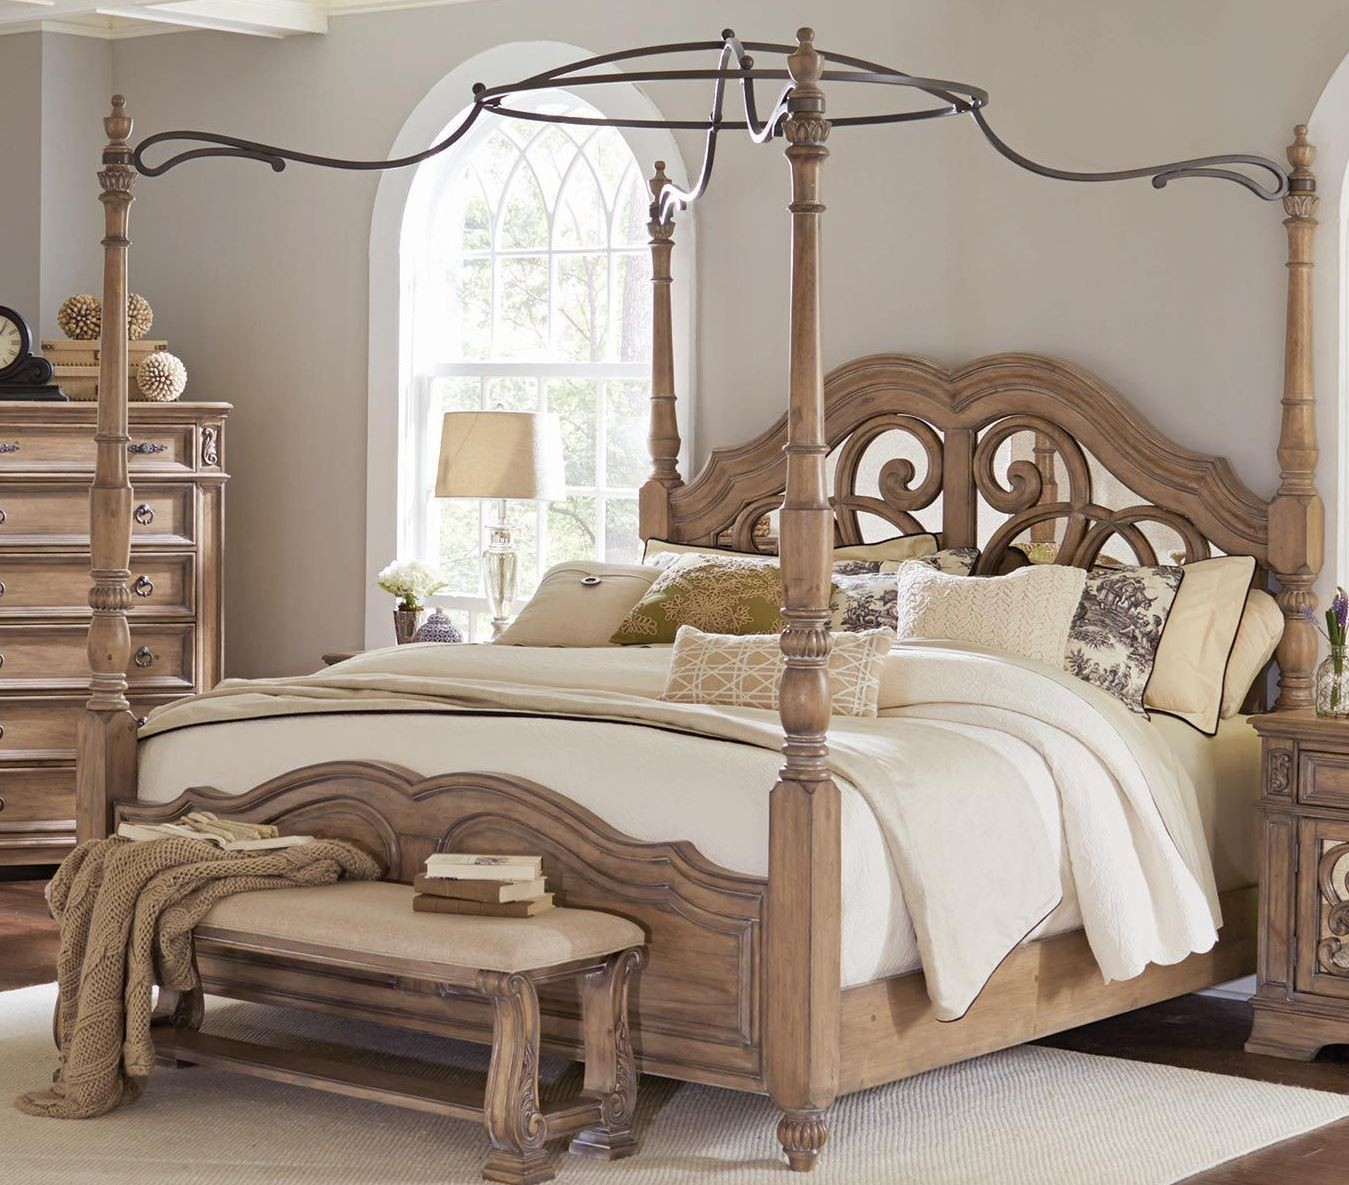 Ilana antique linen poster bedroom set 205071q coaster - King size bedroom sets for sale by owner ...